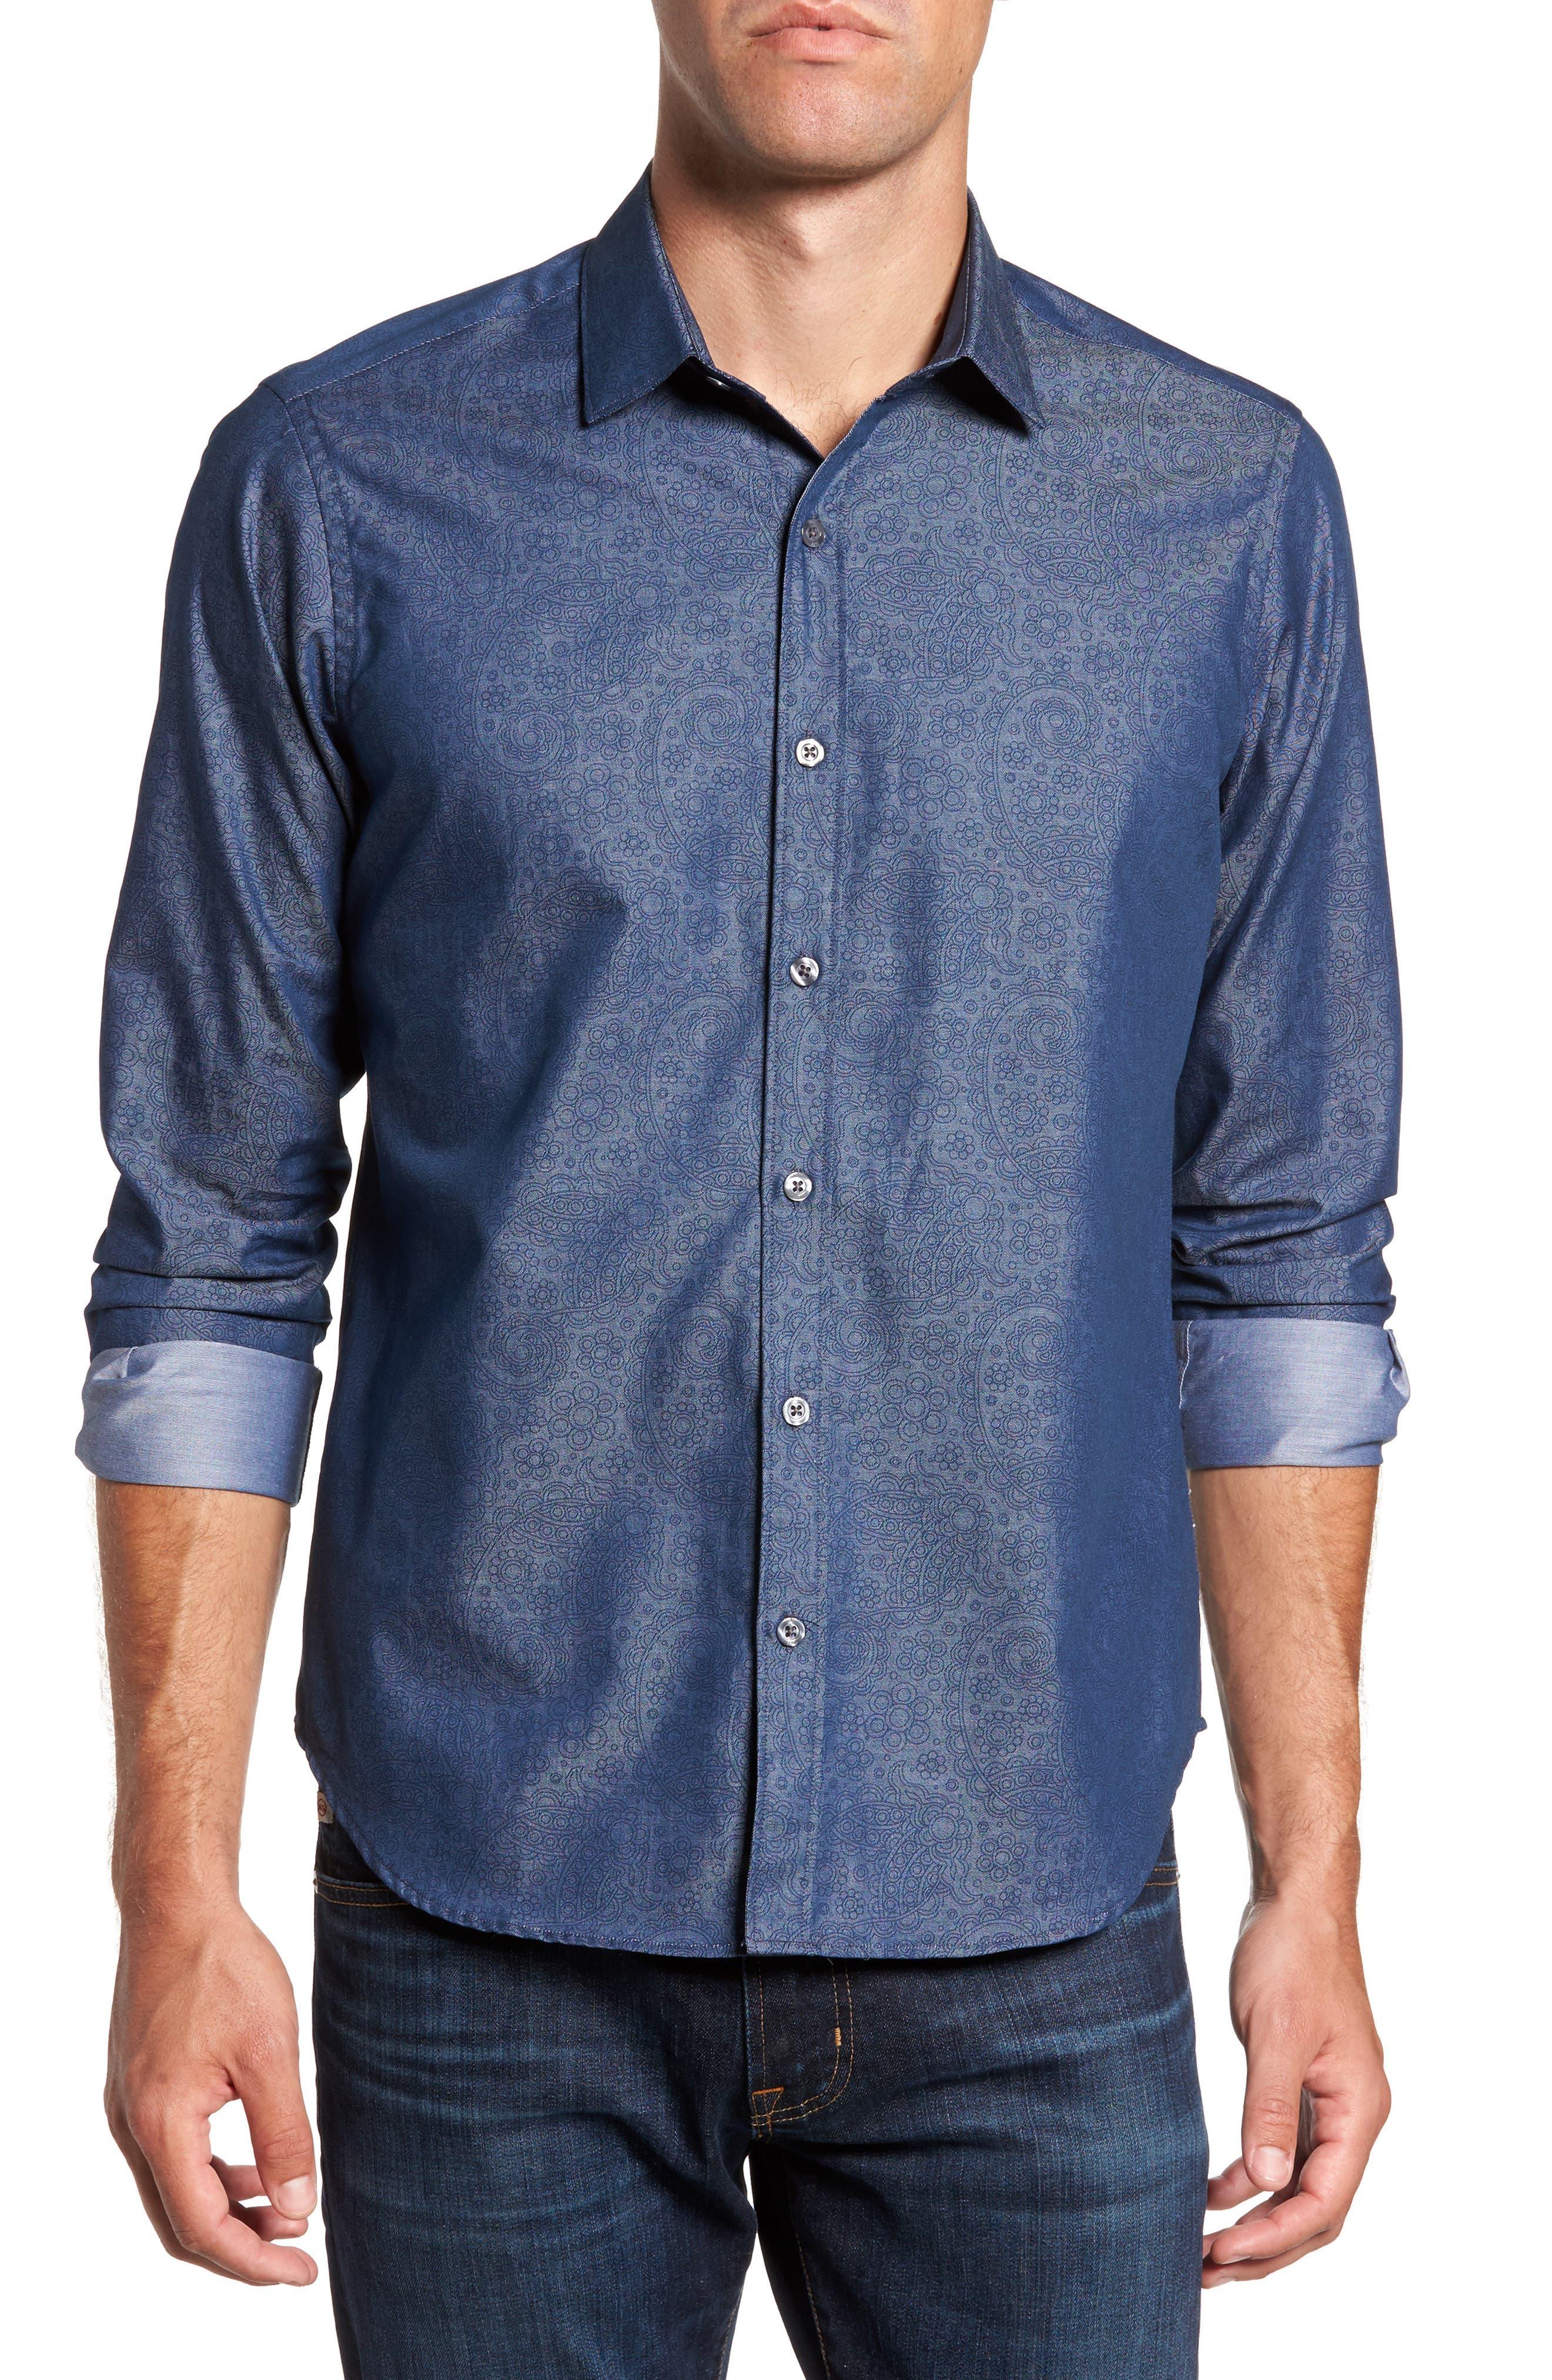 Main Image - Jeff Edison Slim Fit Paisley Print Sport Shirt